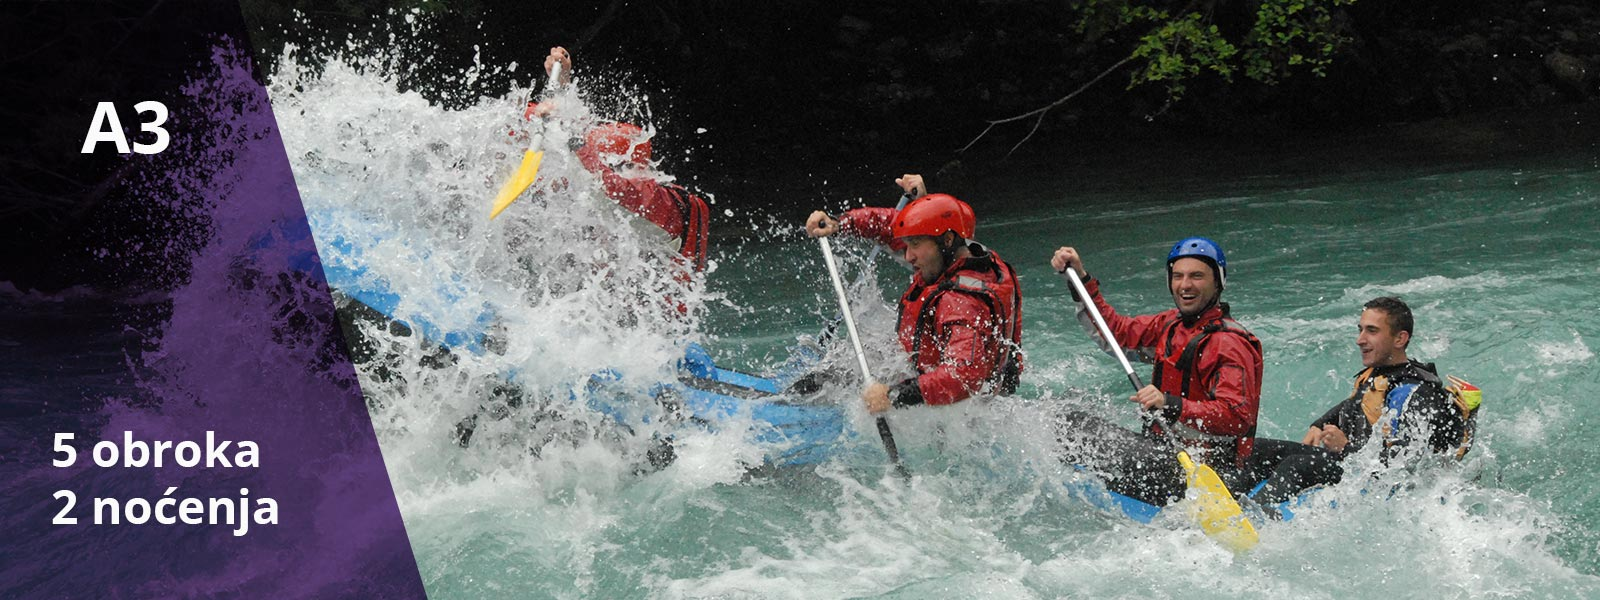 Rafting aranzman Adrenalin 3